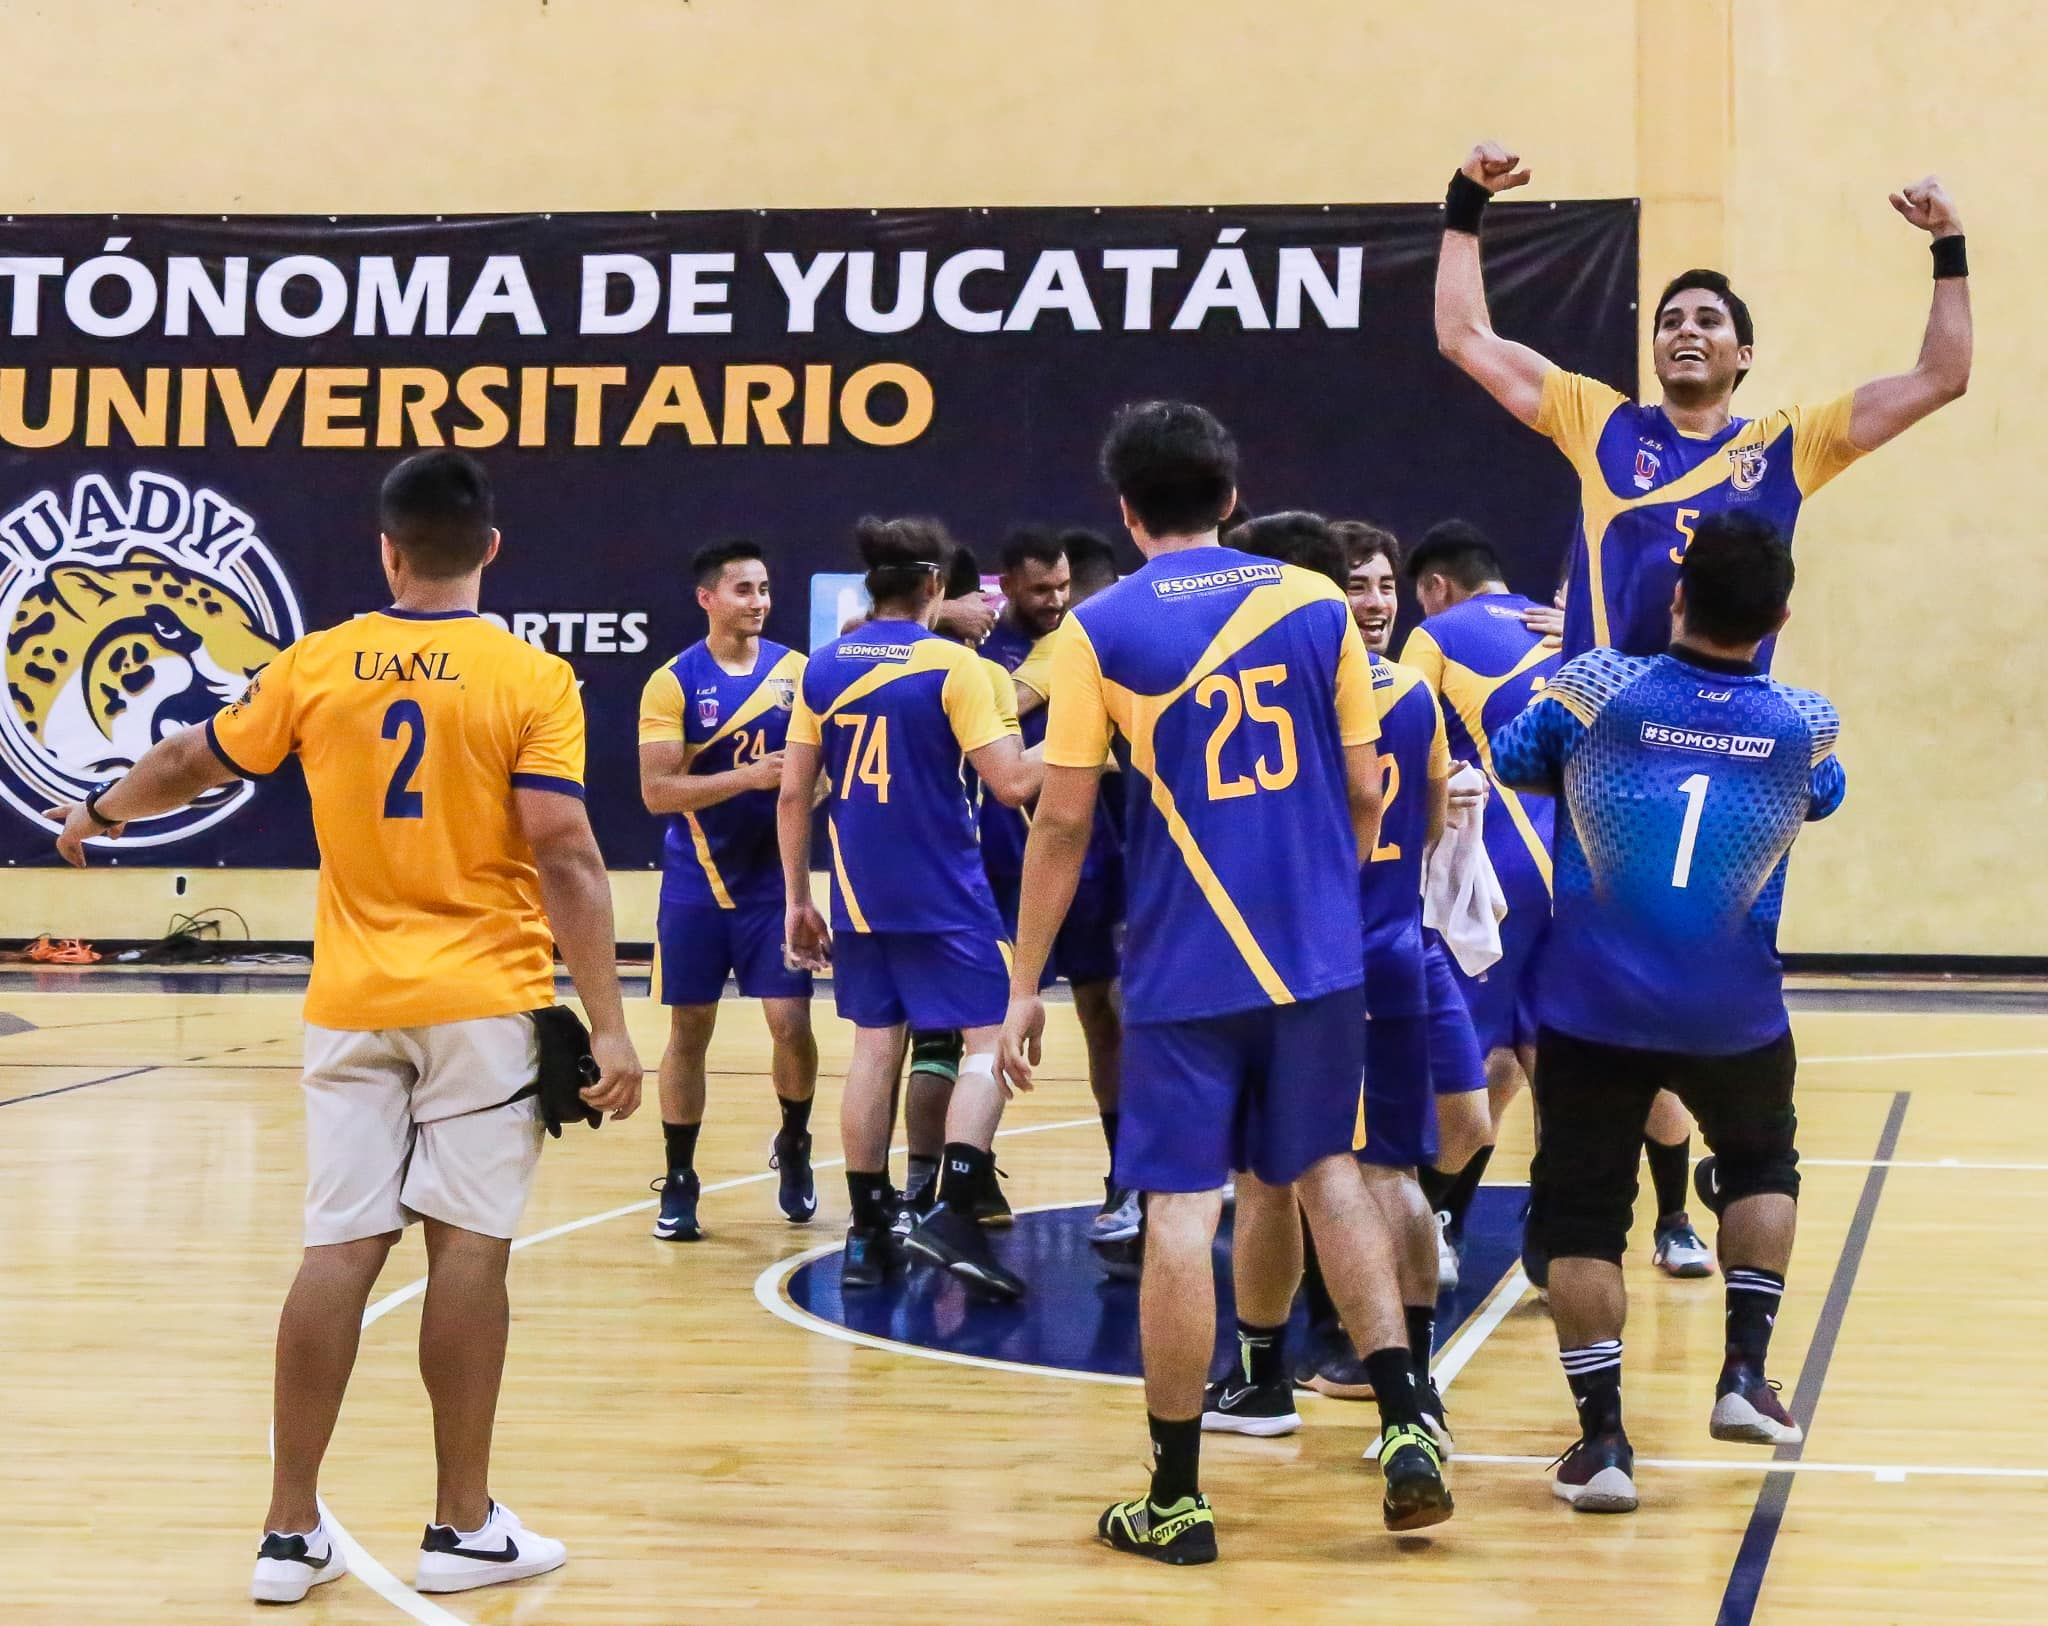 Festejo de Handball varonil campeones 2019